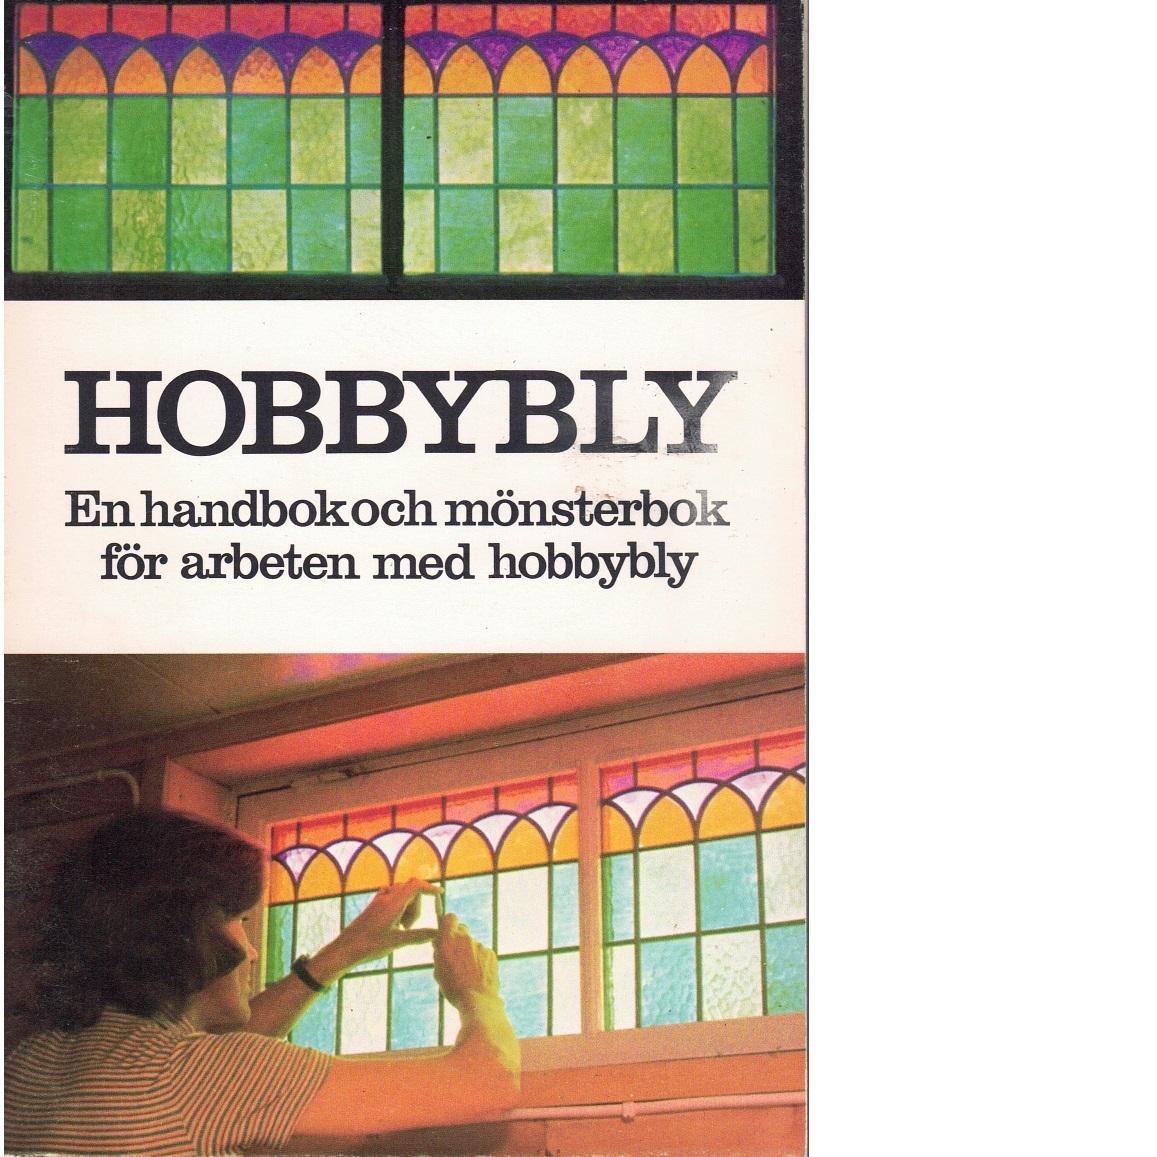 Hobbybly - Red.